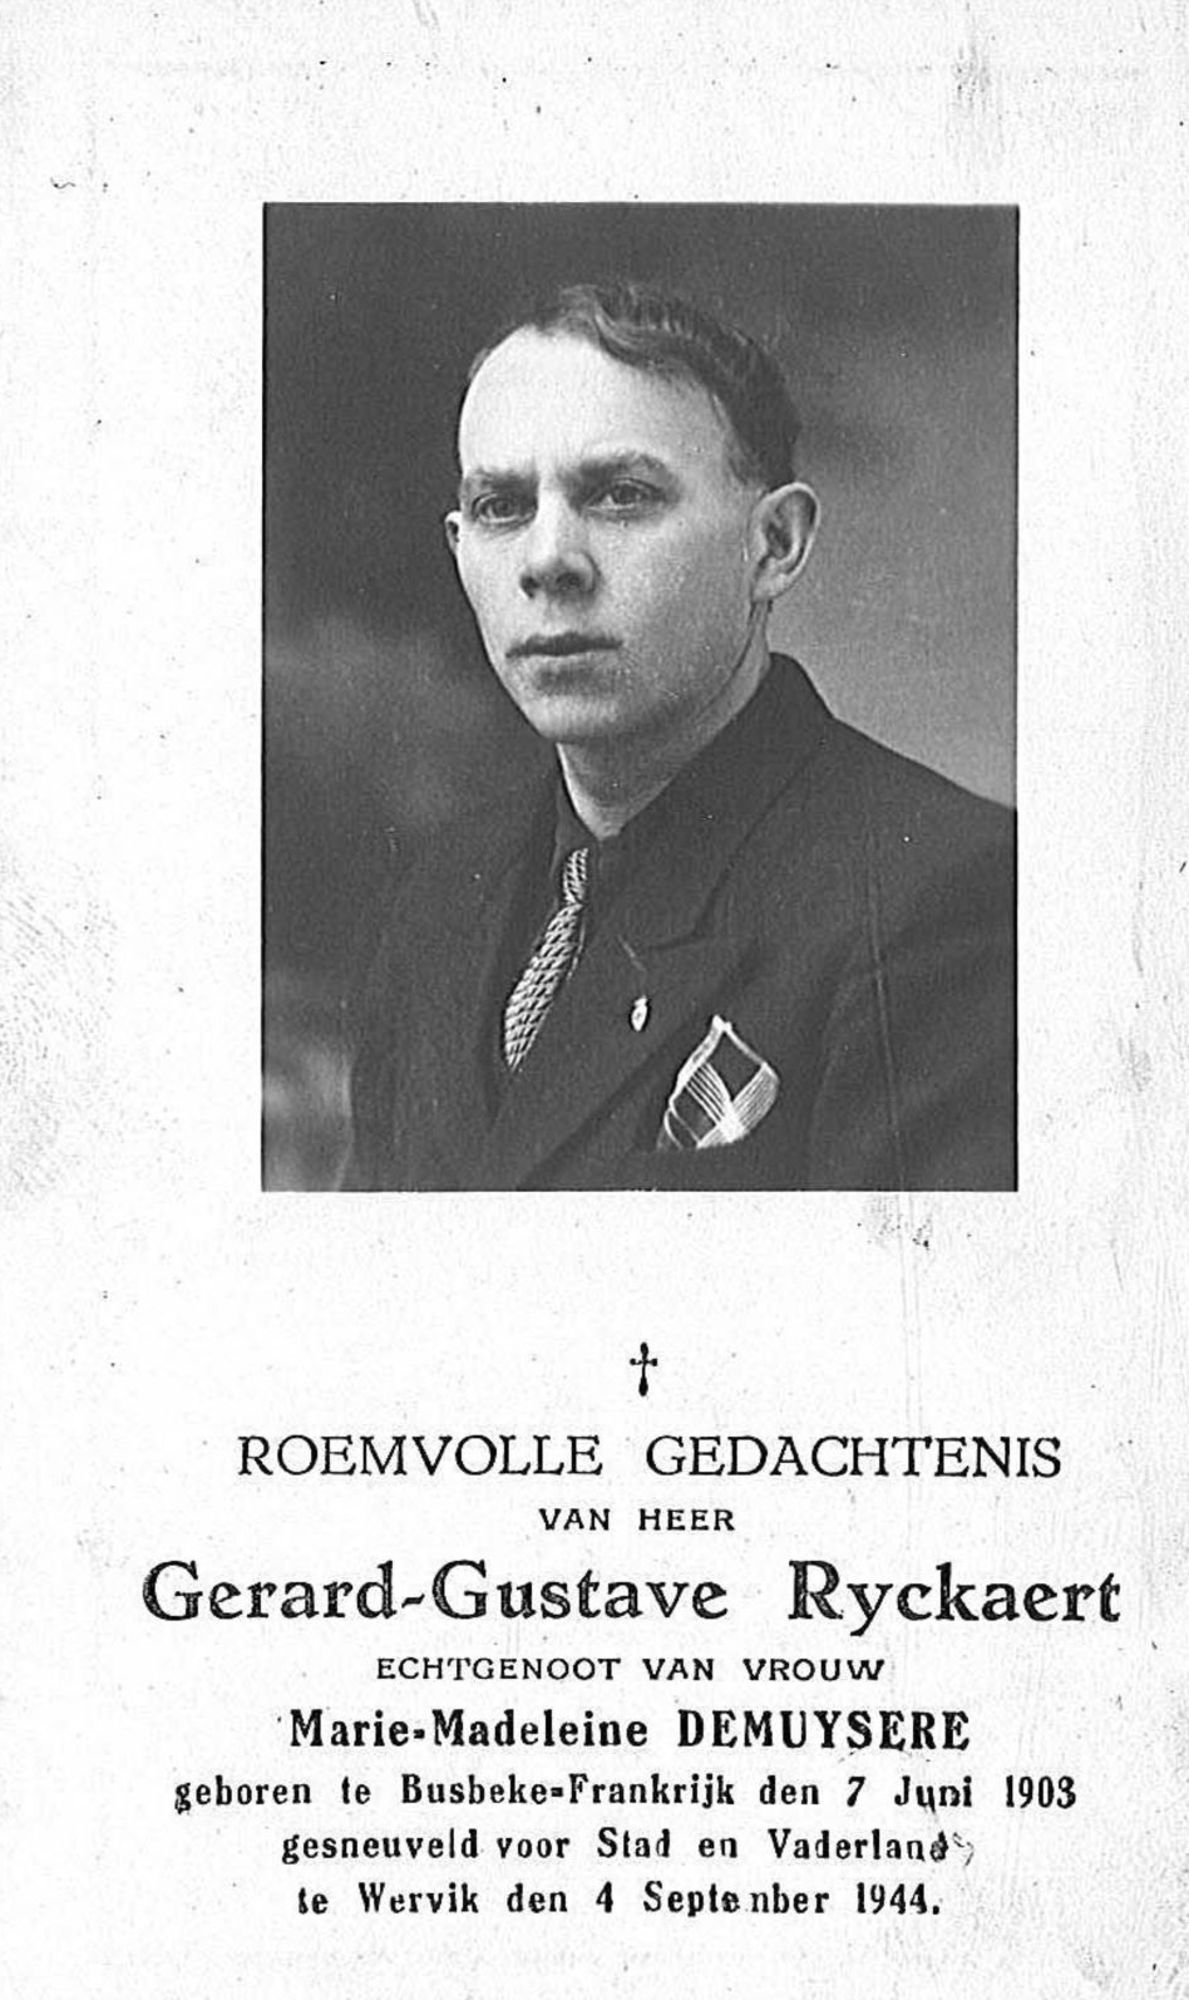 Gerard-Gustave Ryckaert